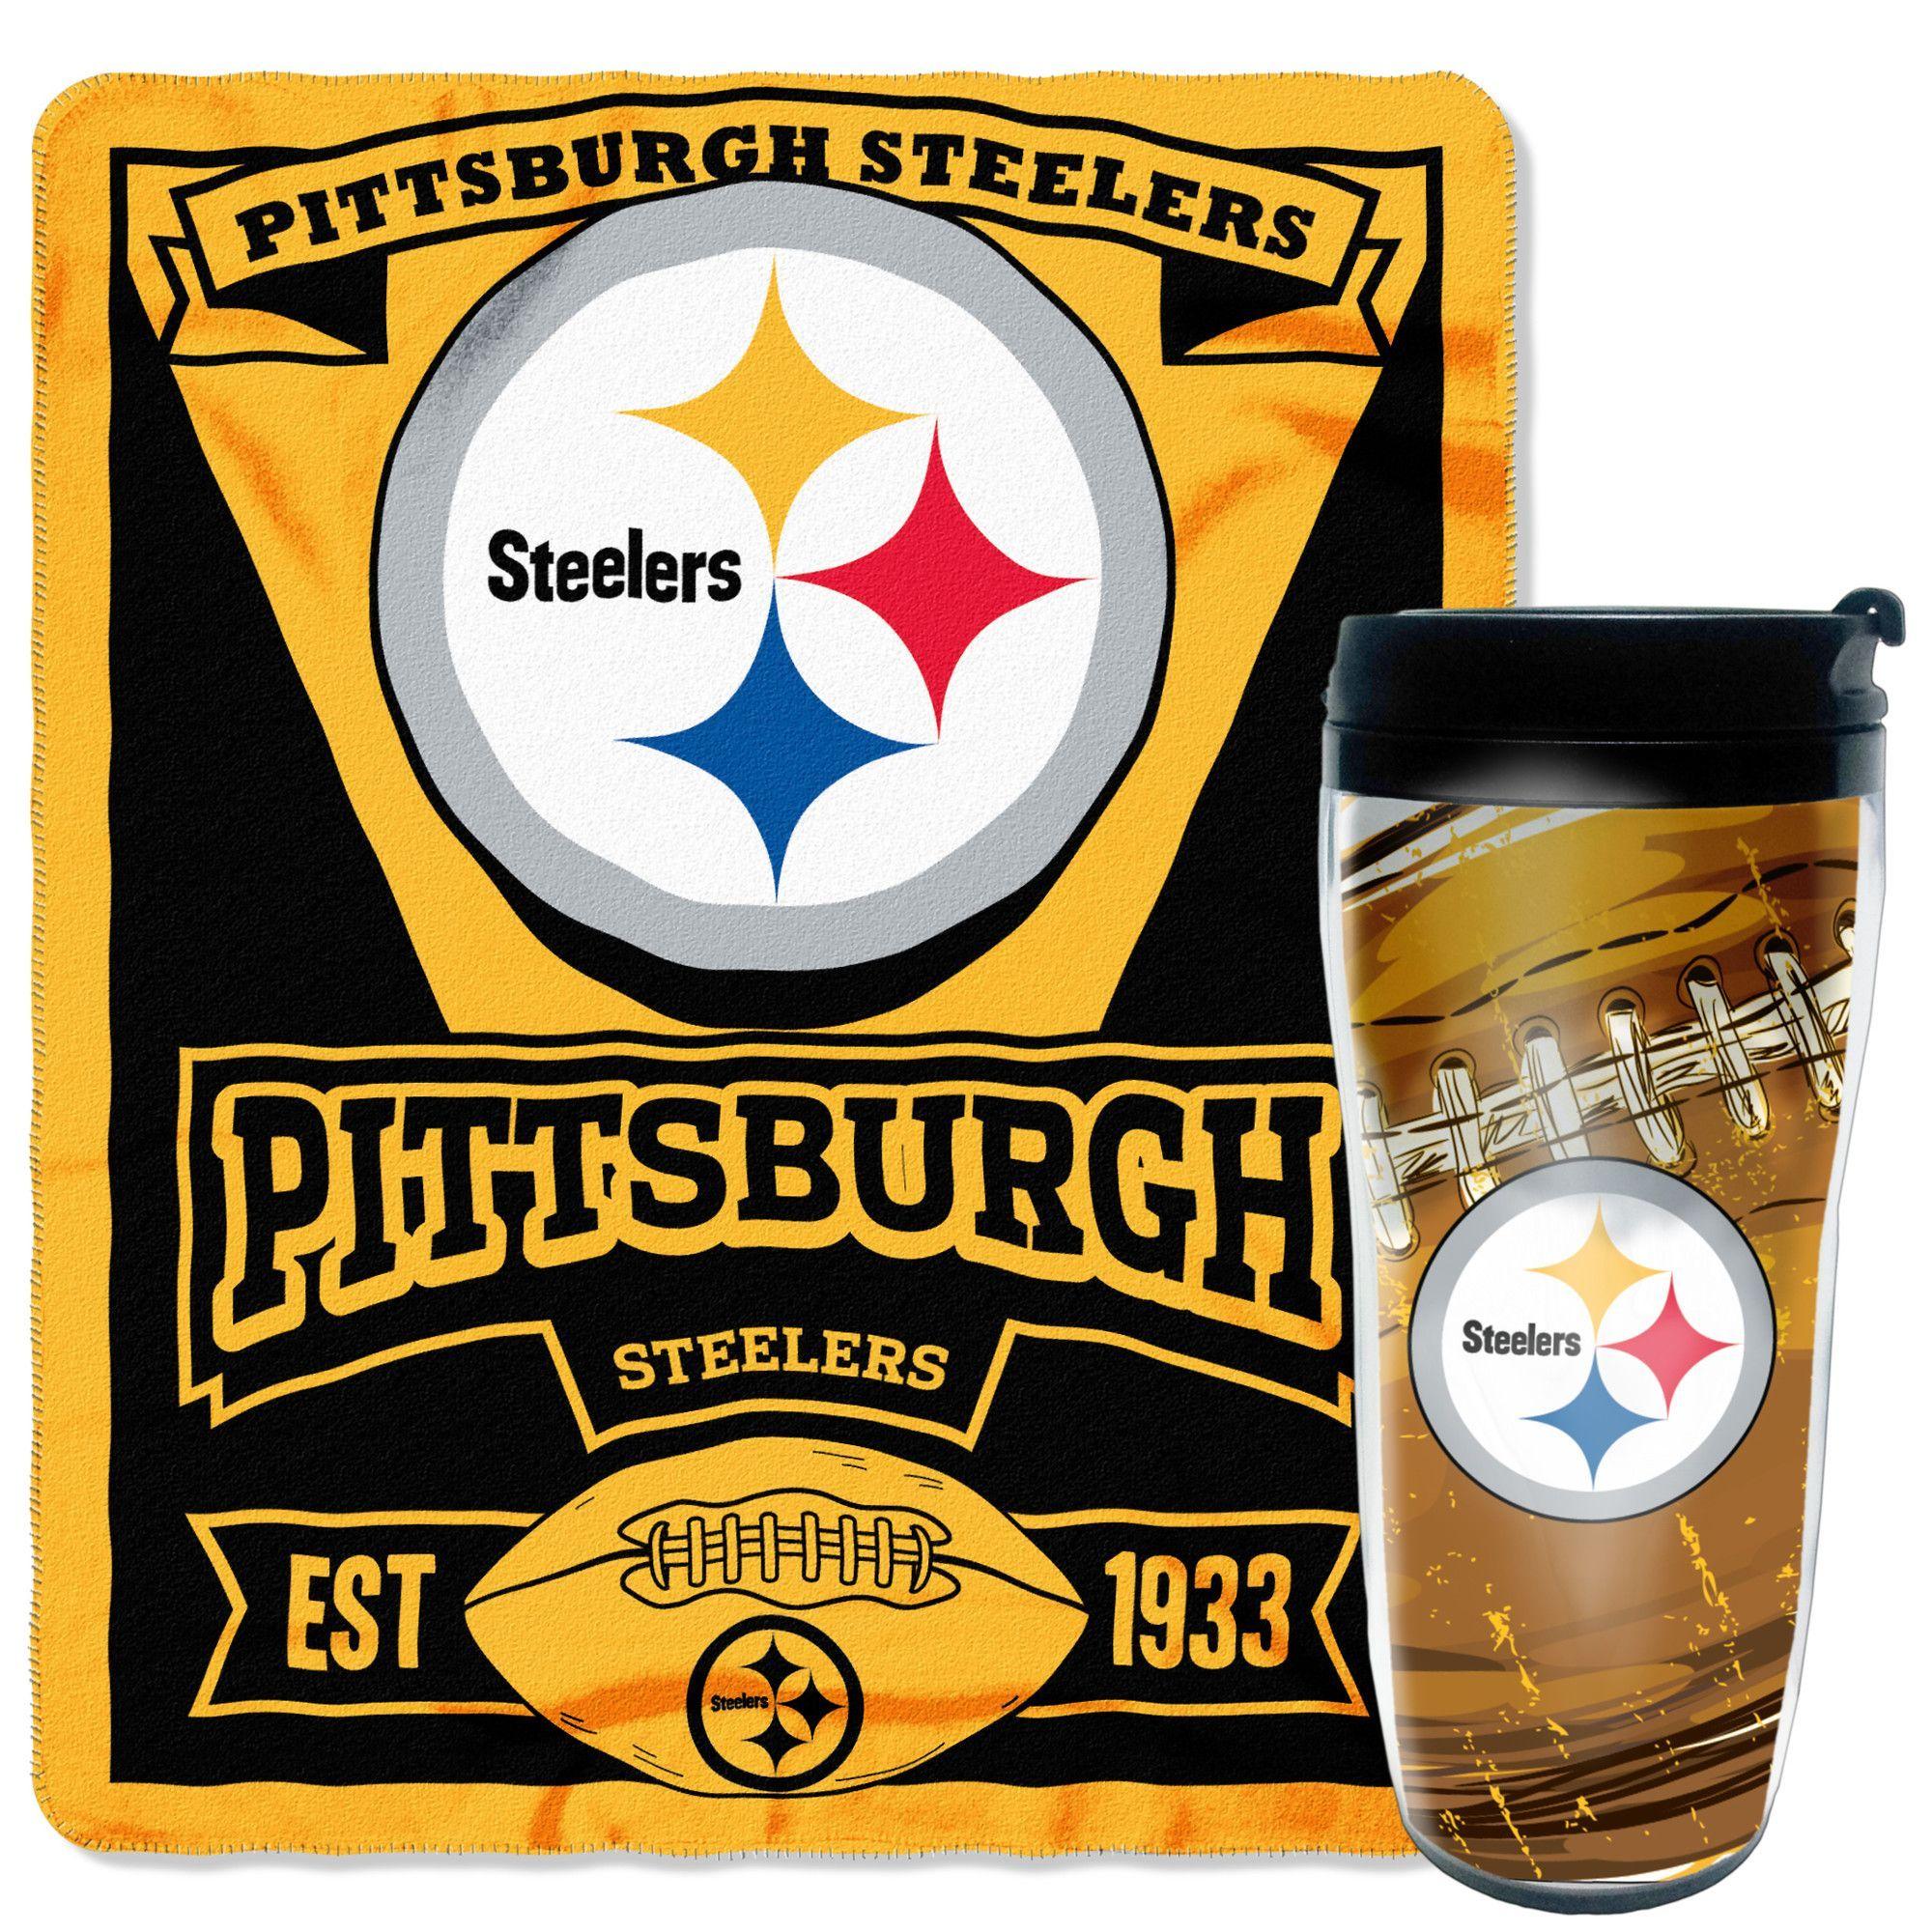 NFL Steelers 2 Piece Fleece Throw and Travel Mug Set | Products ...